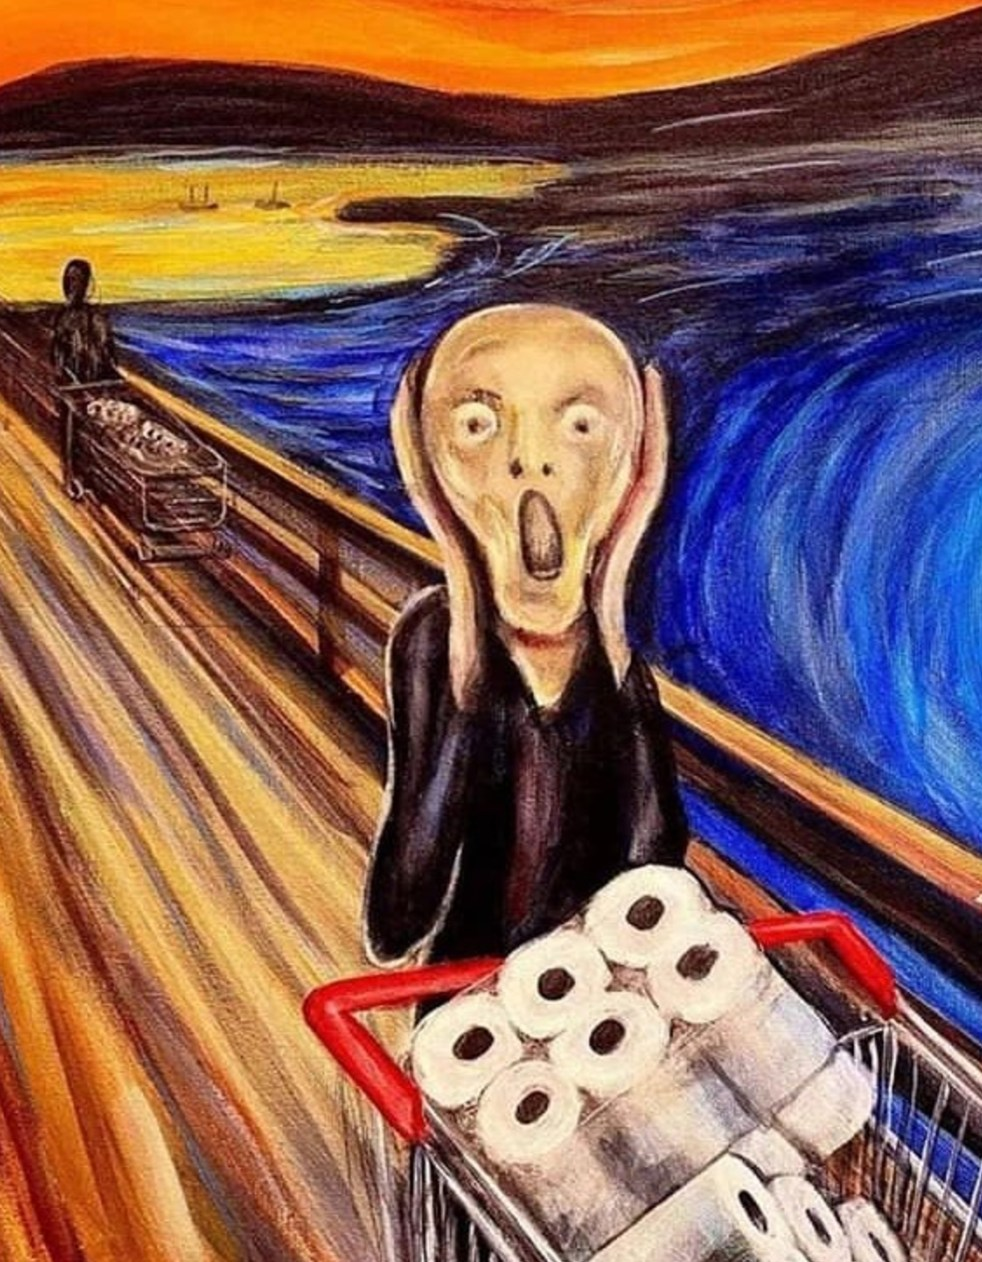 L'Urlo di Munch - in fila a comprare la carta igienica